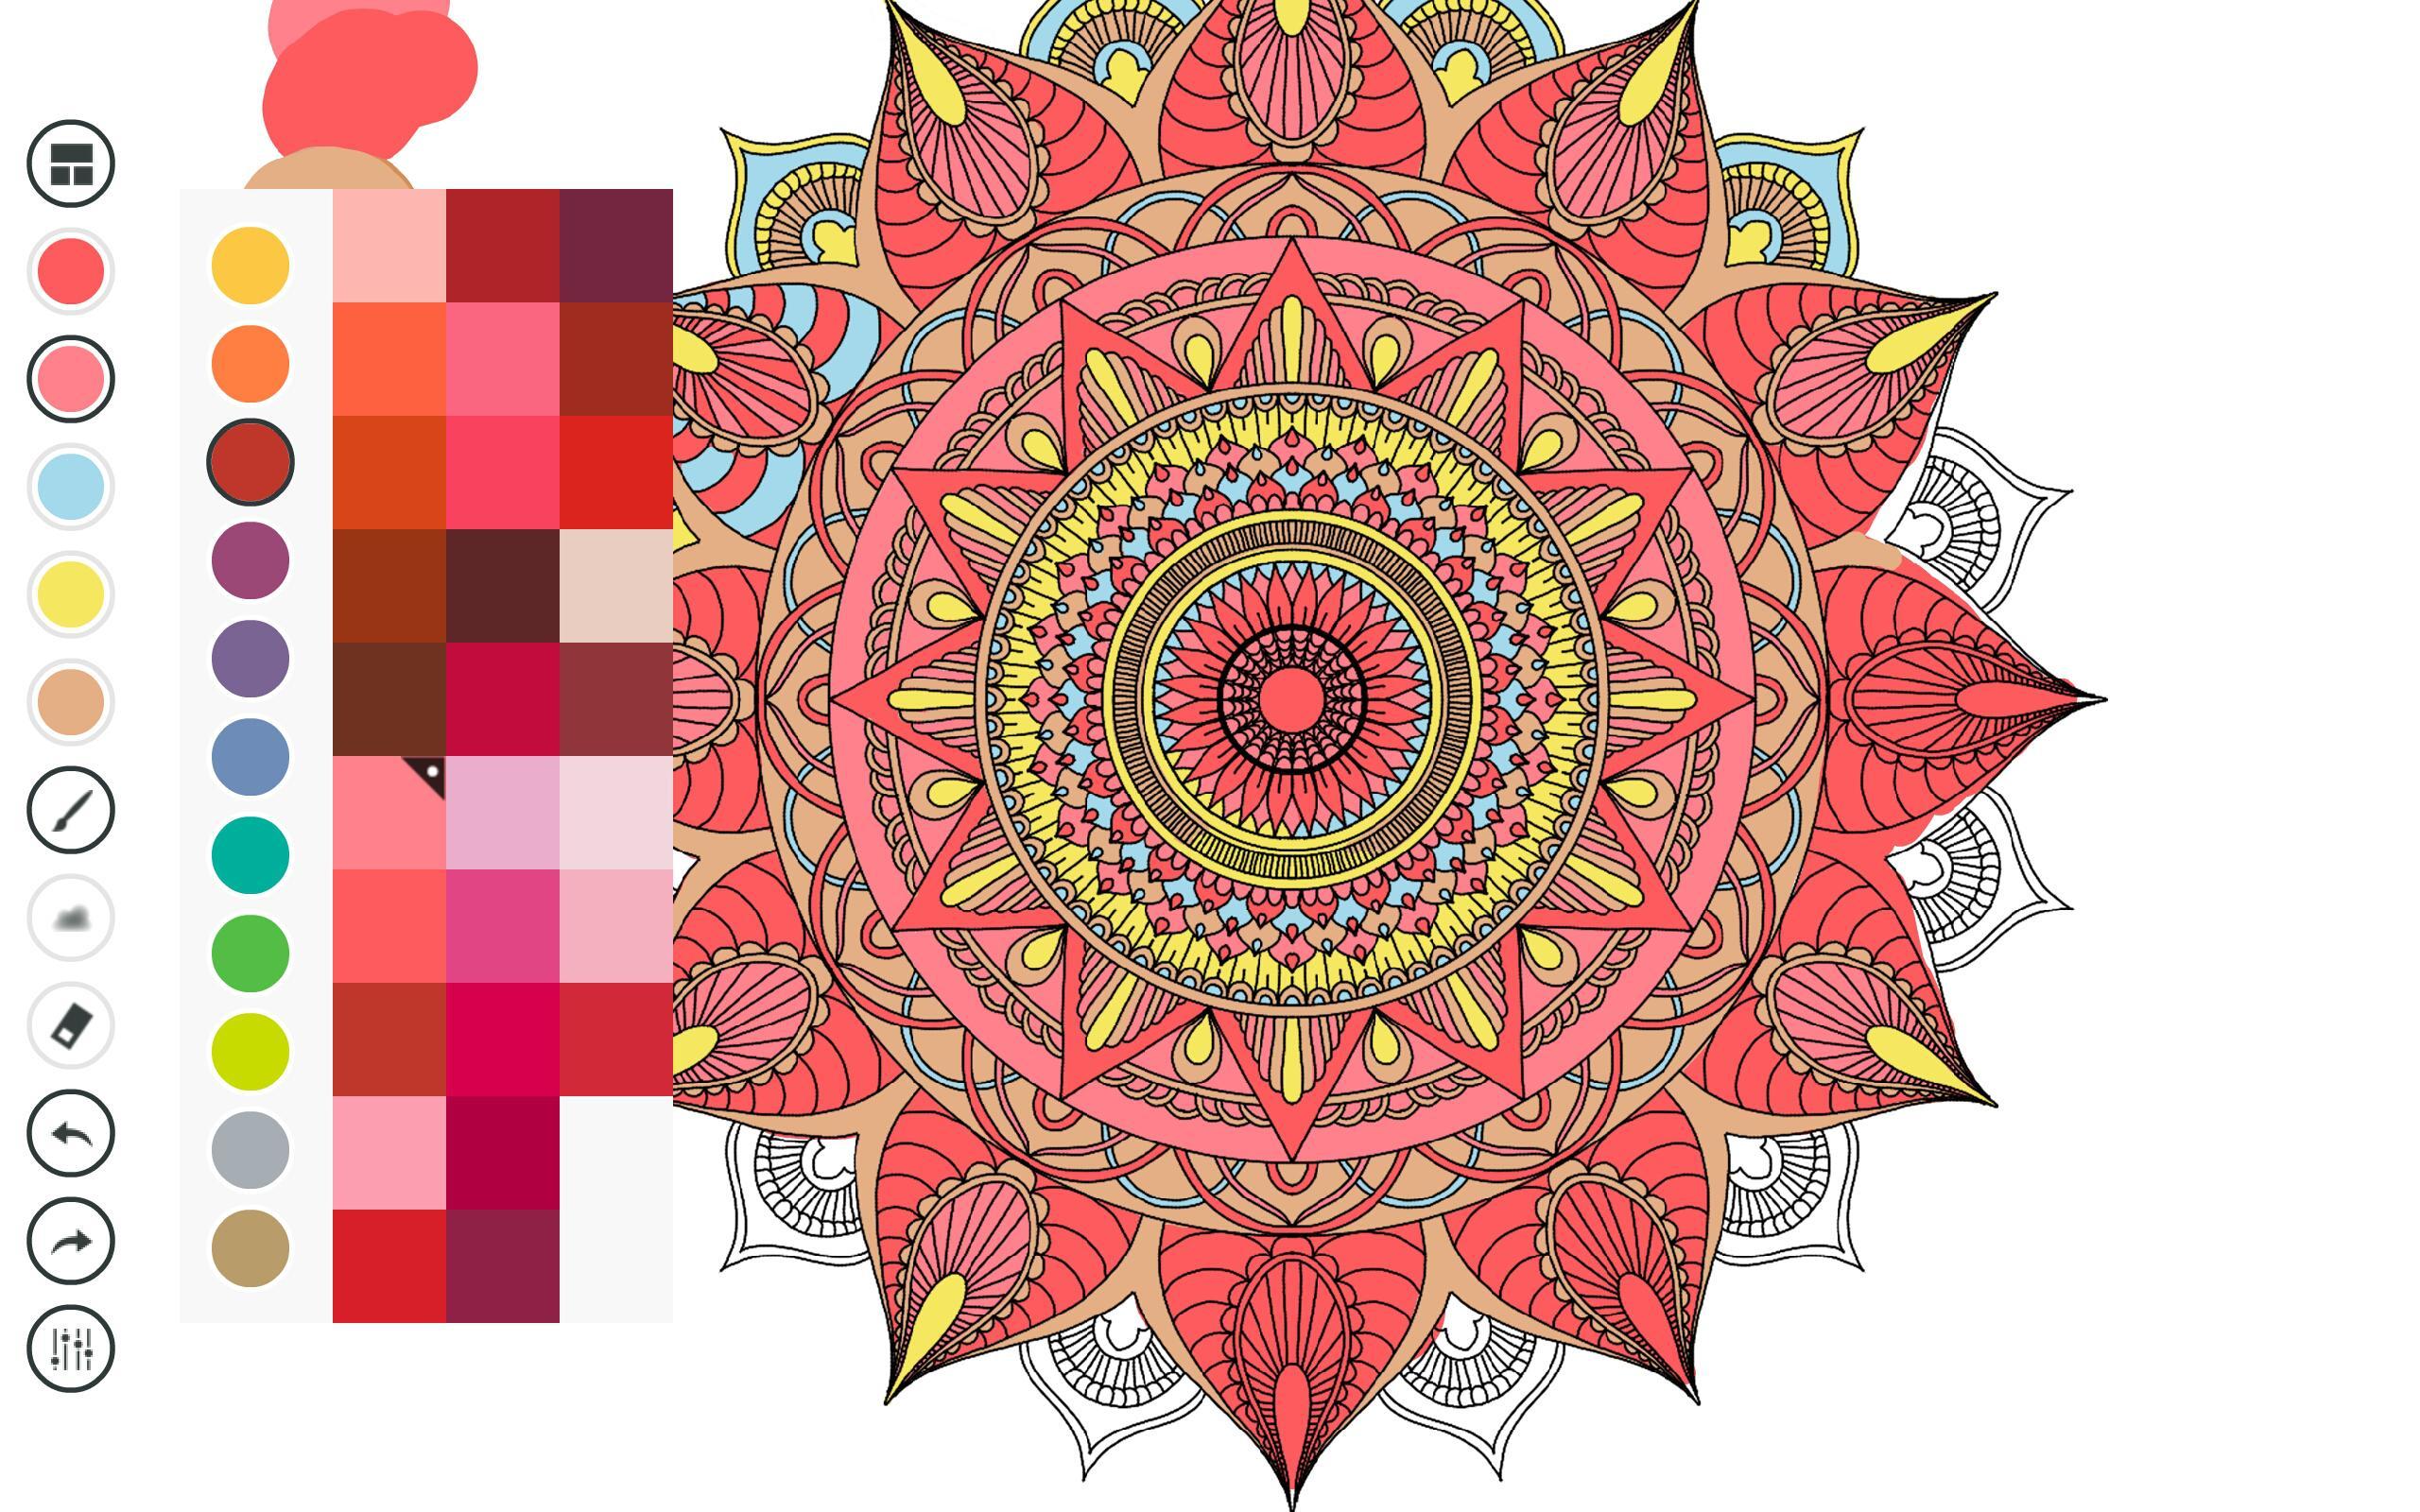 Caraboutcha, coloring poster